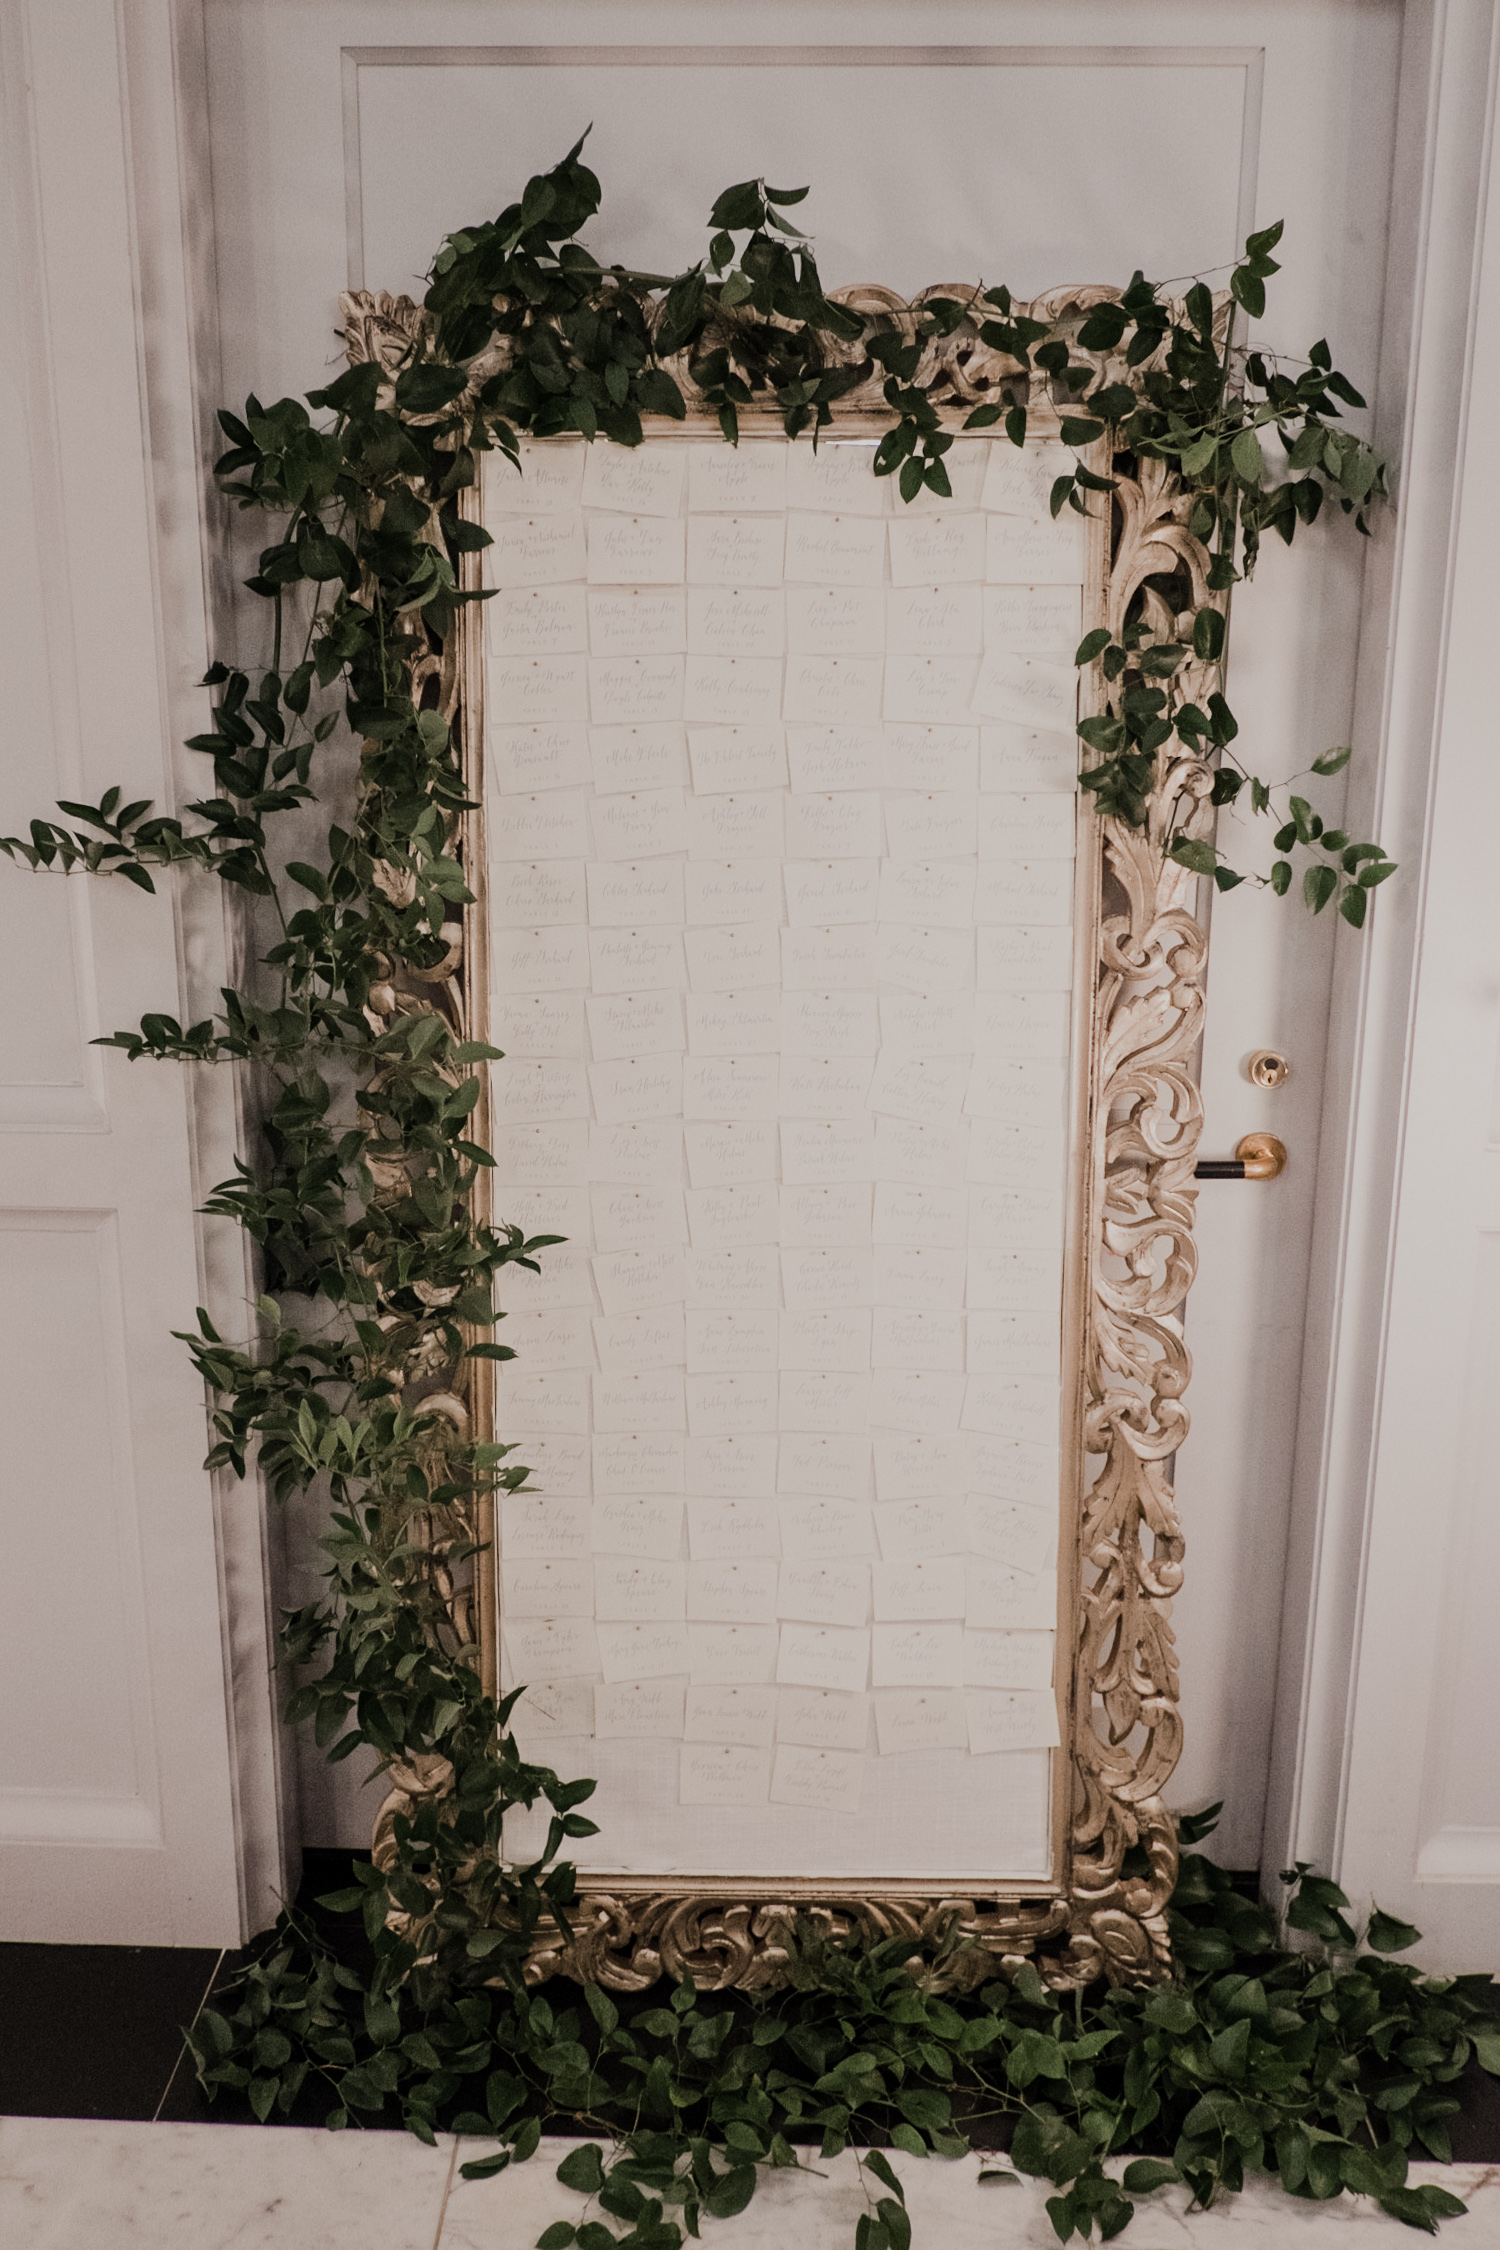 dc line hotel place card floral mirror frame display wedding reception inspiration